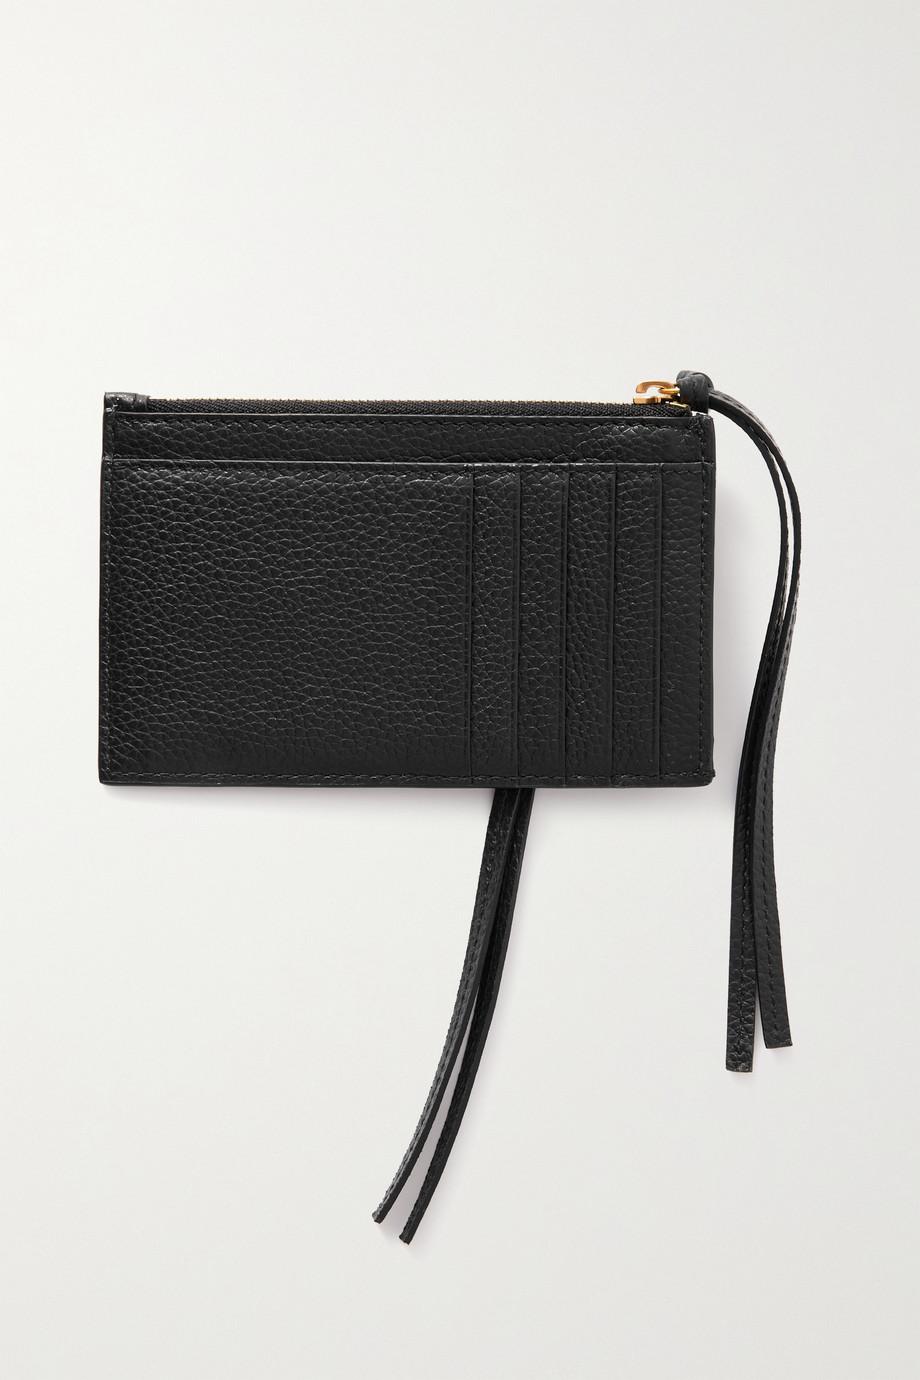 Balenciaga Neo Classic textured-leather cardholder